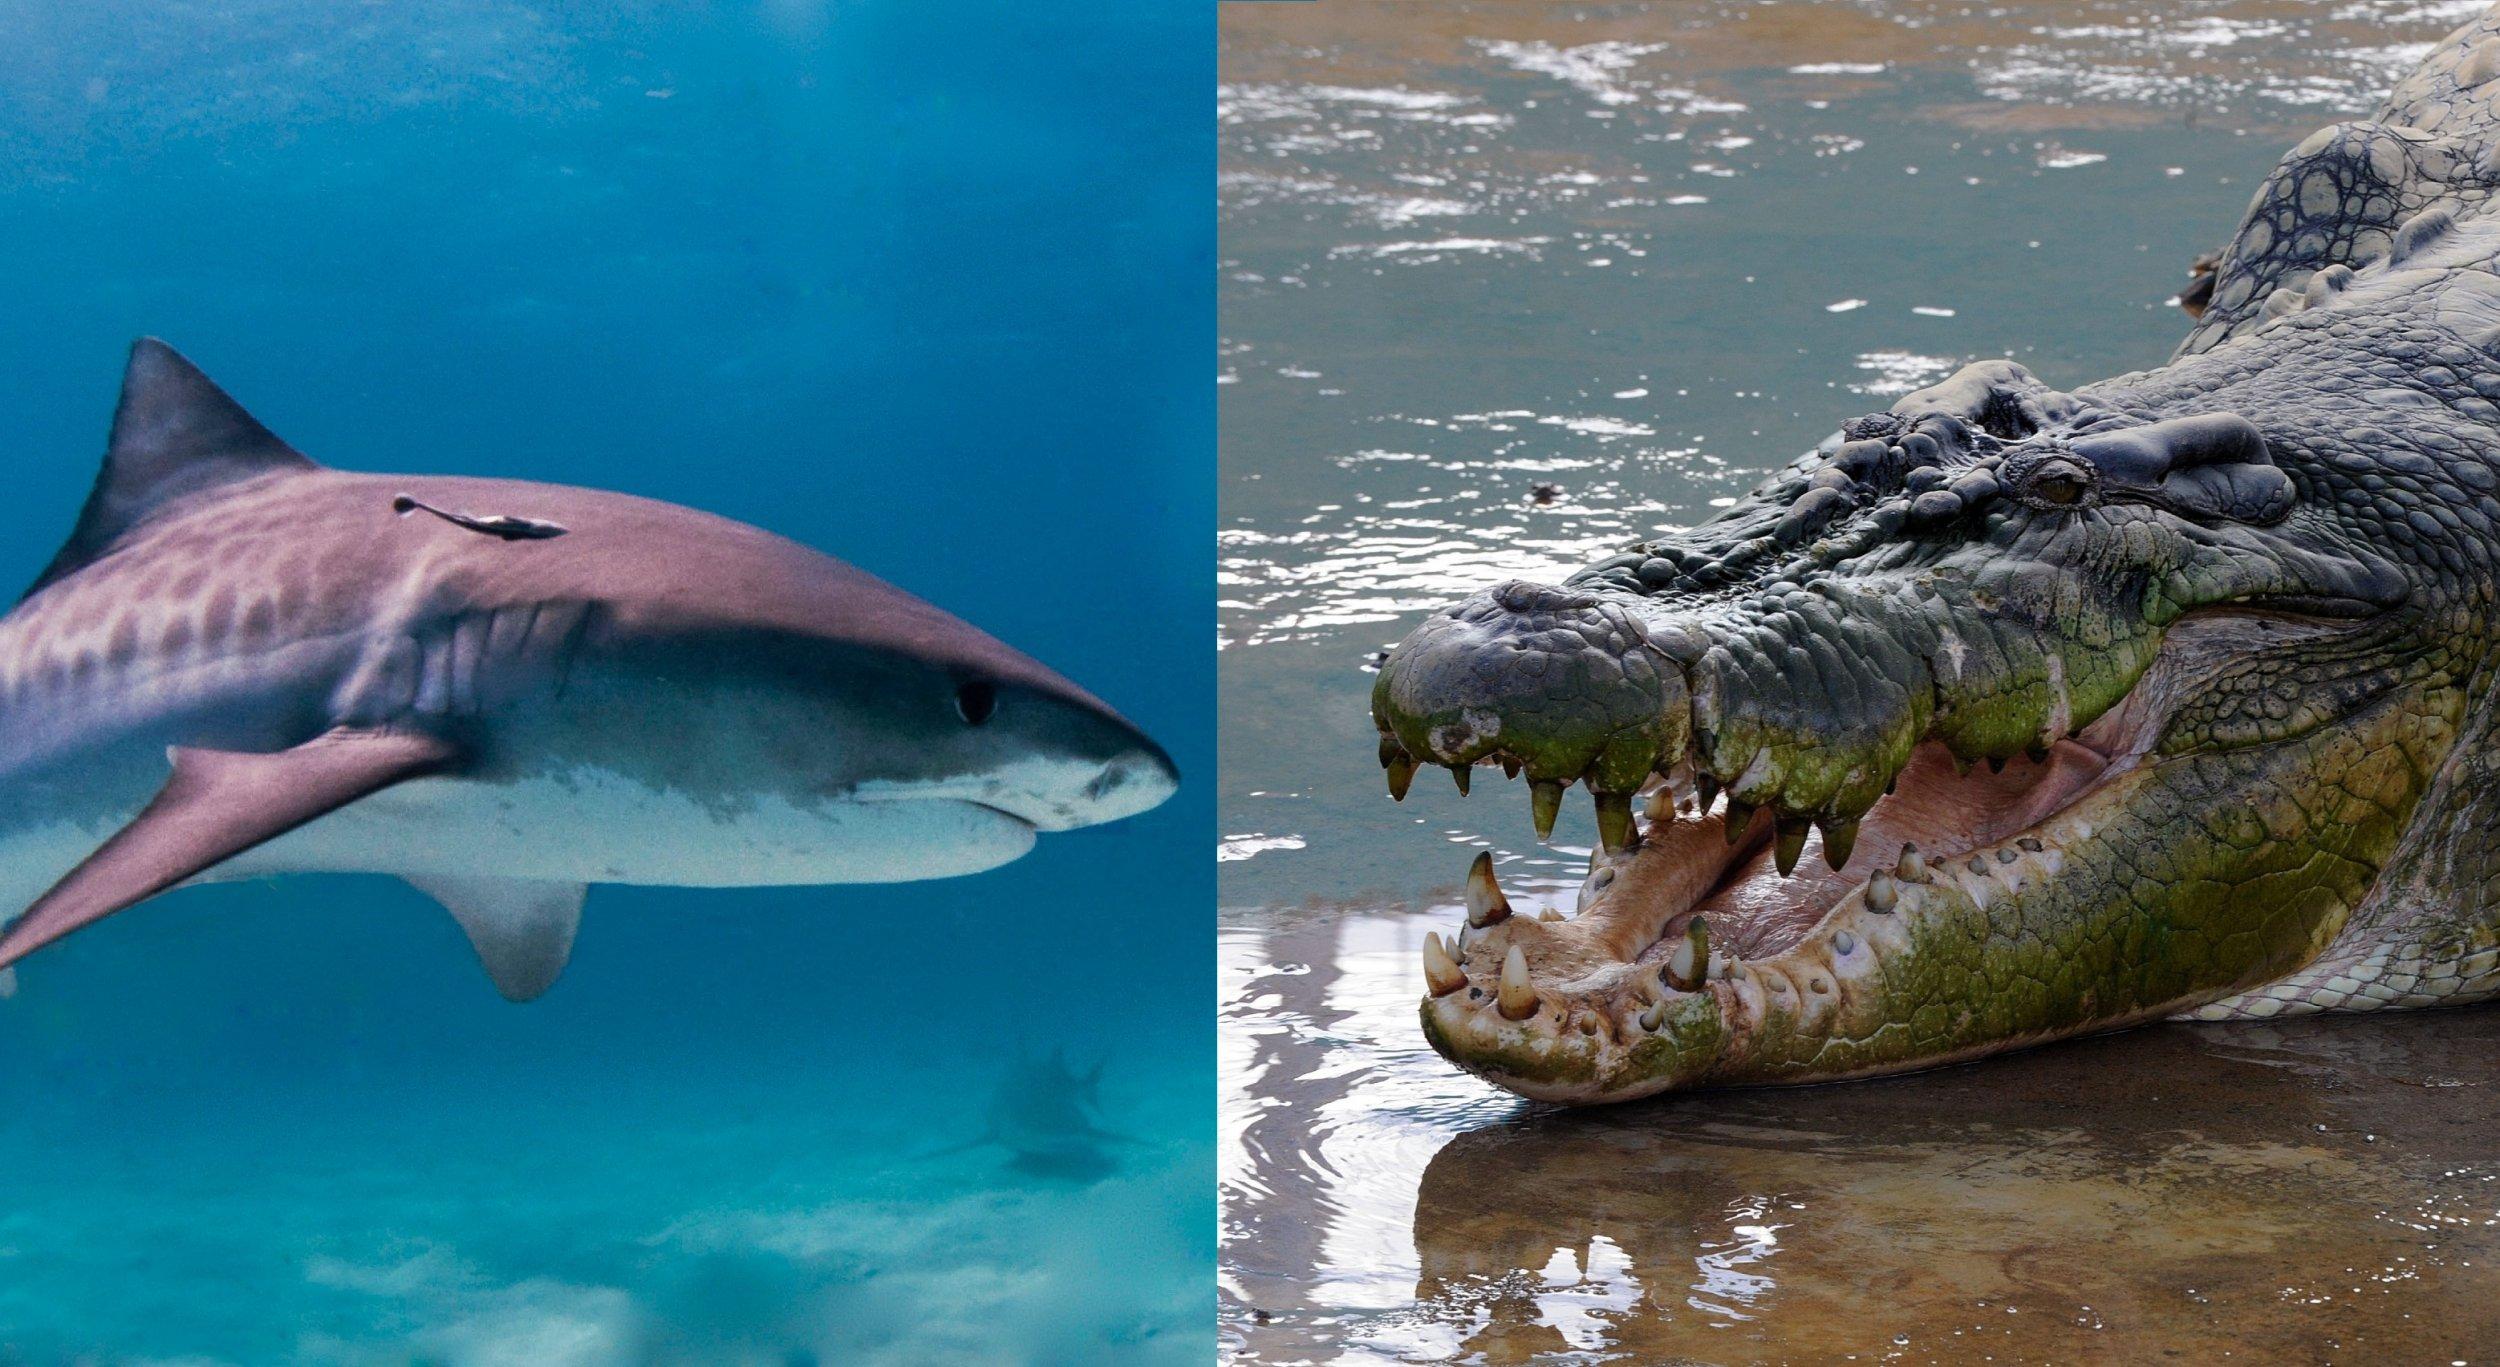 Shark and croc